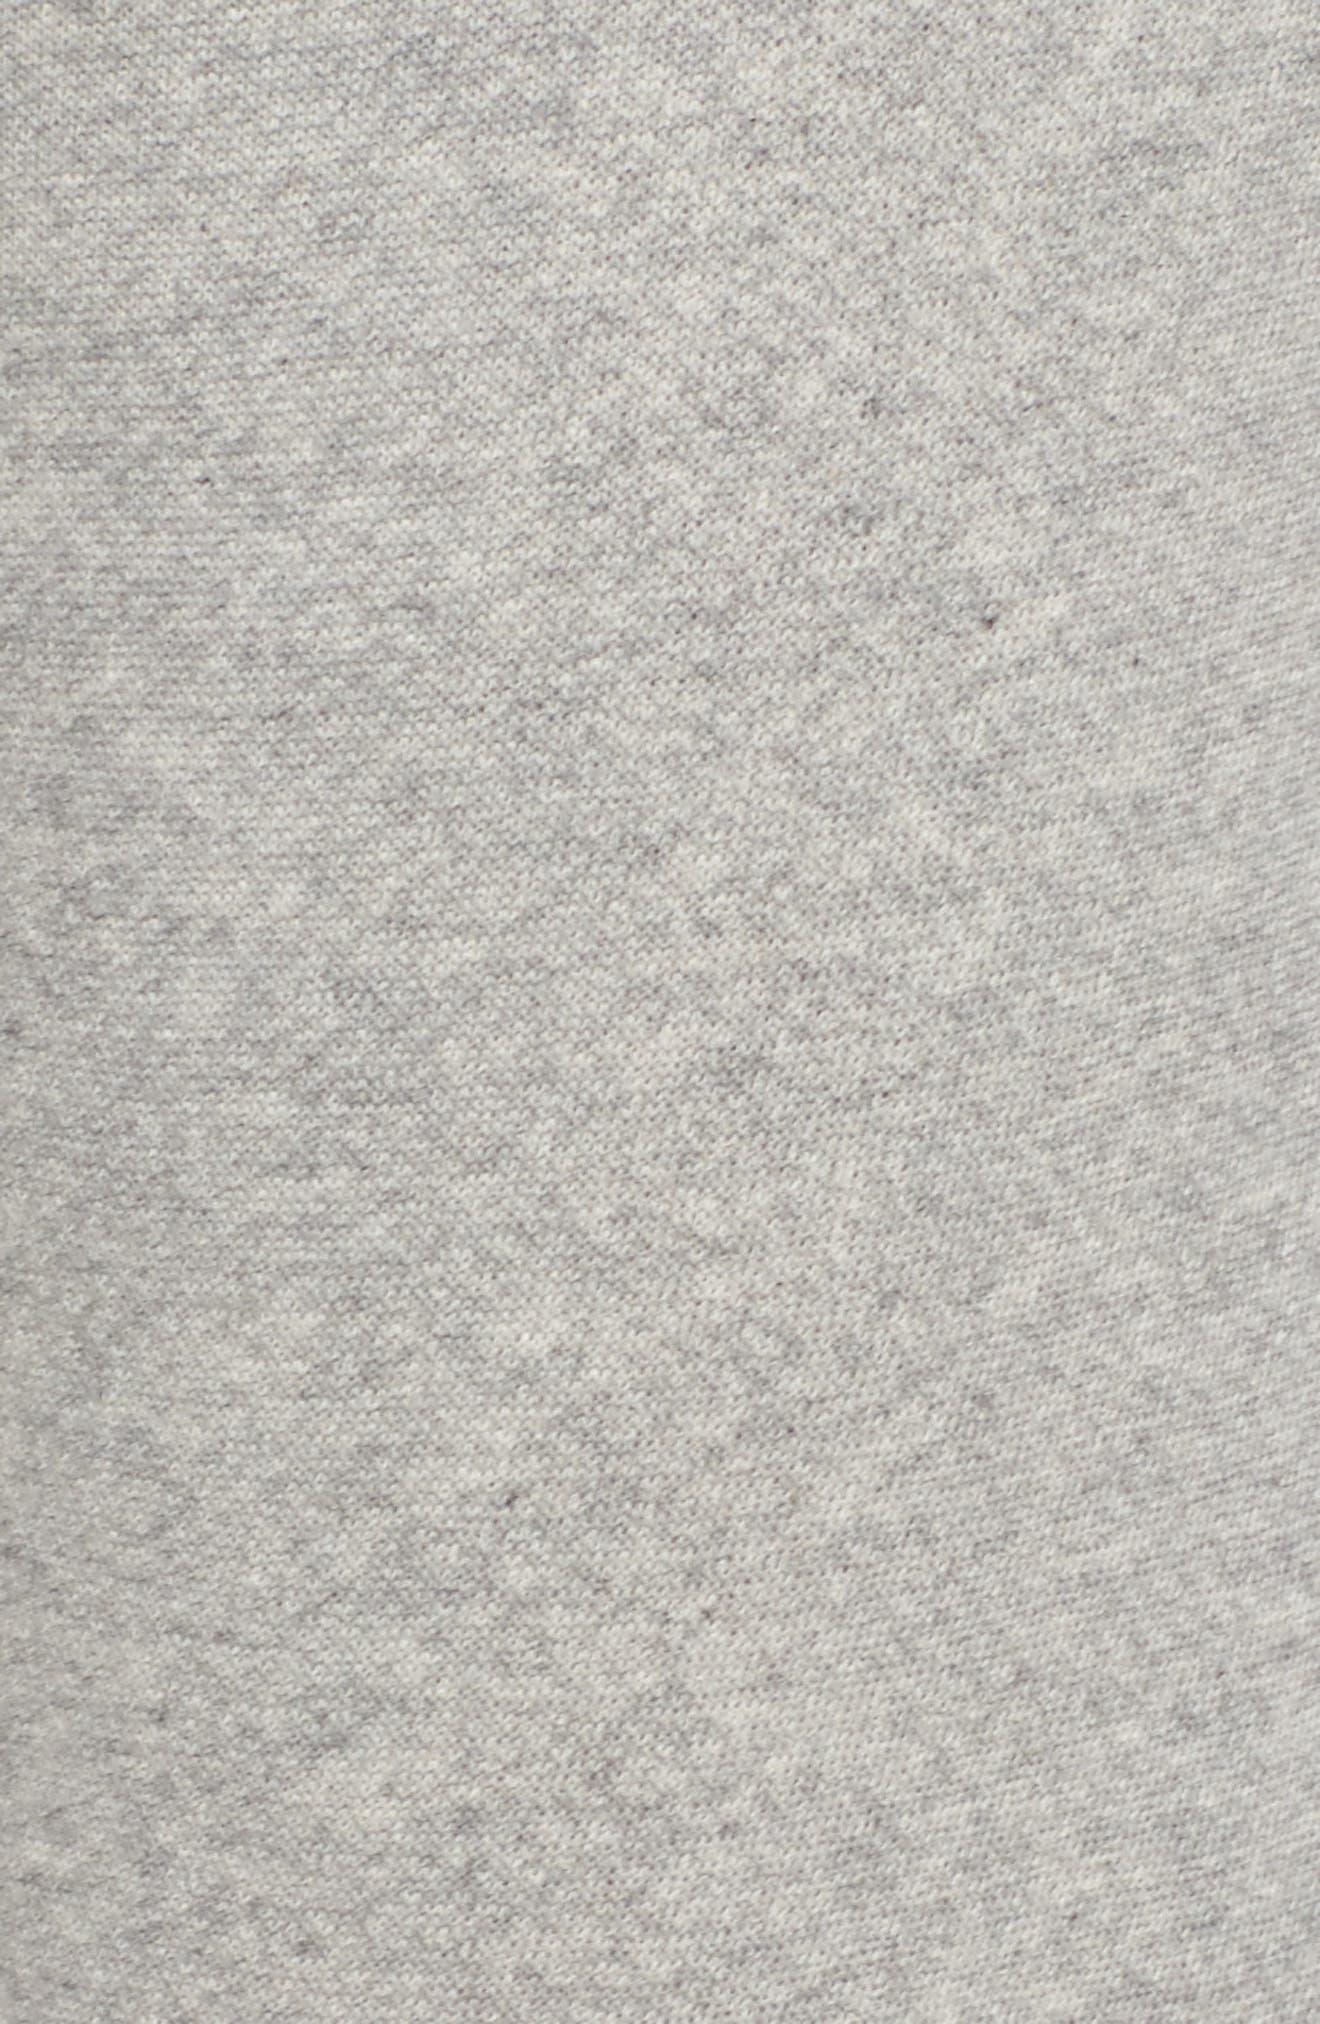 Sweatpants,                             Alternate thumbnail 6, color,                             061